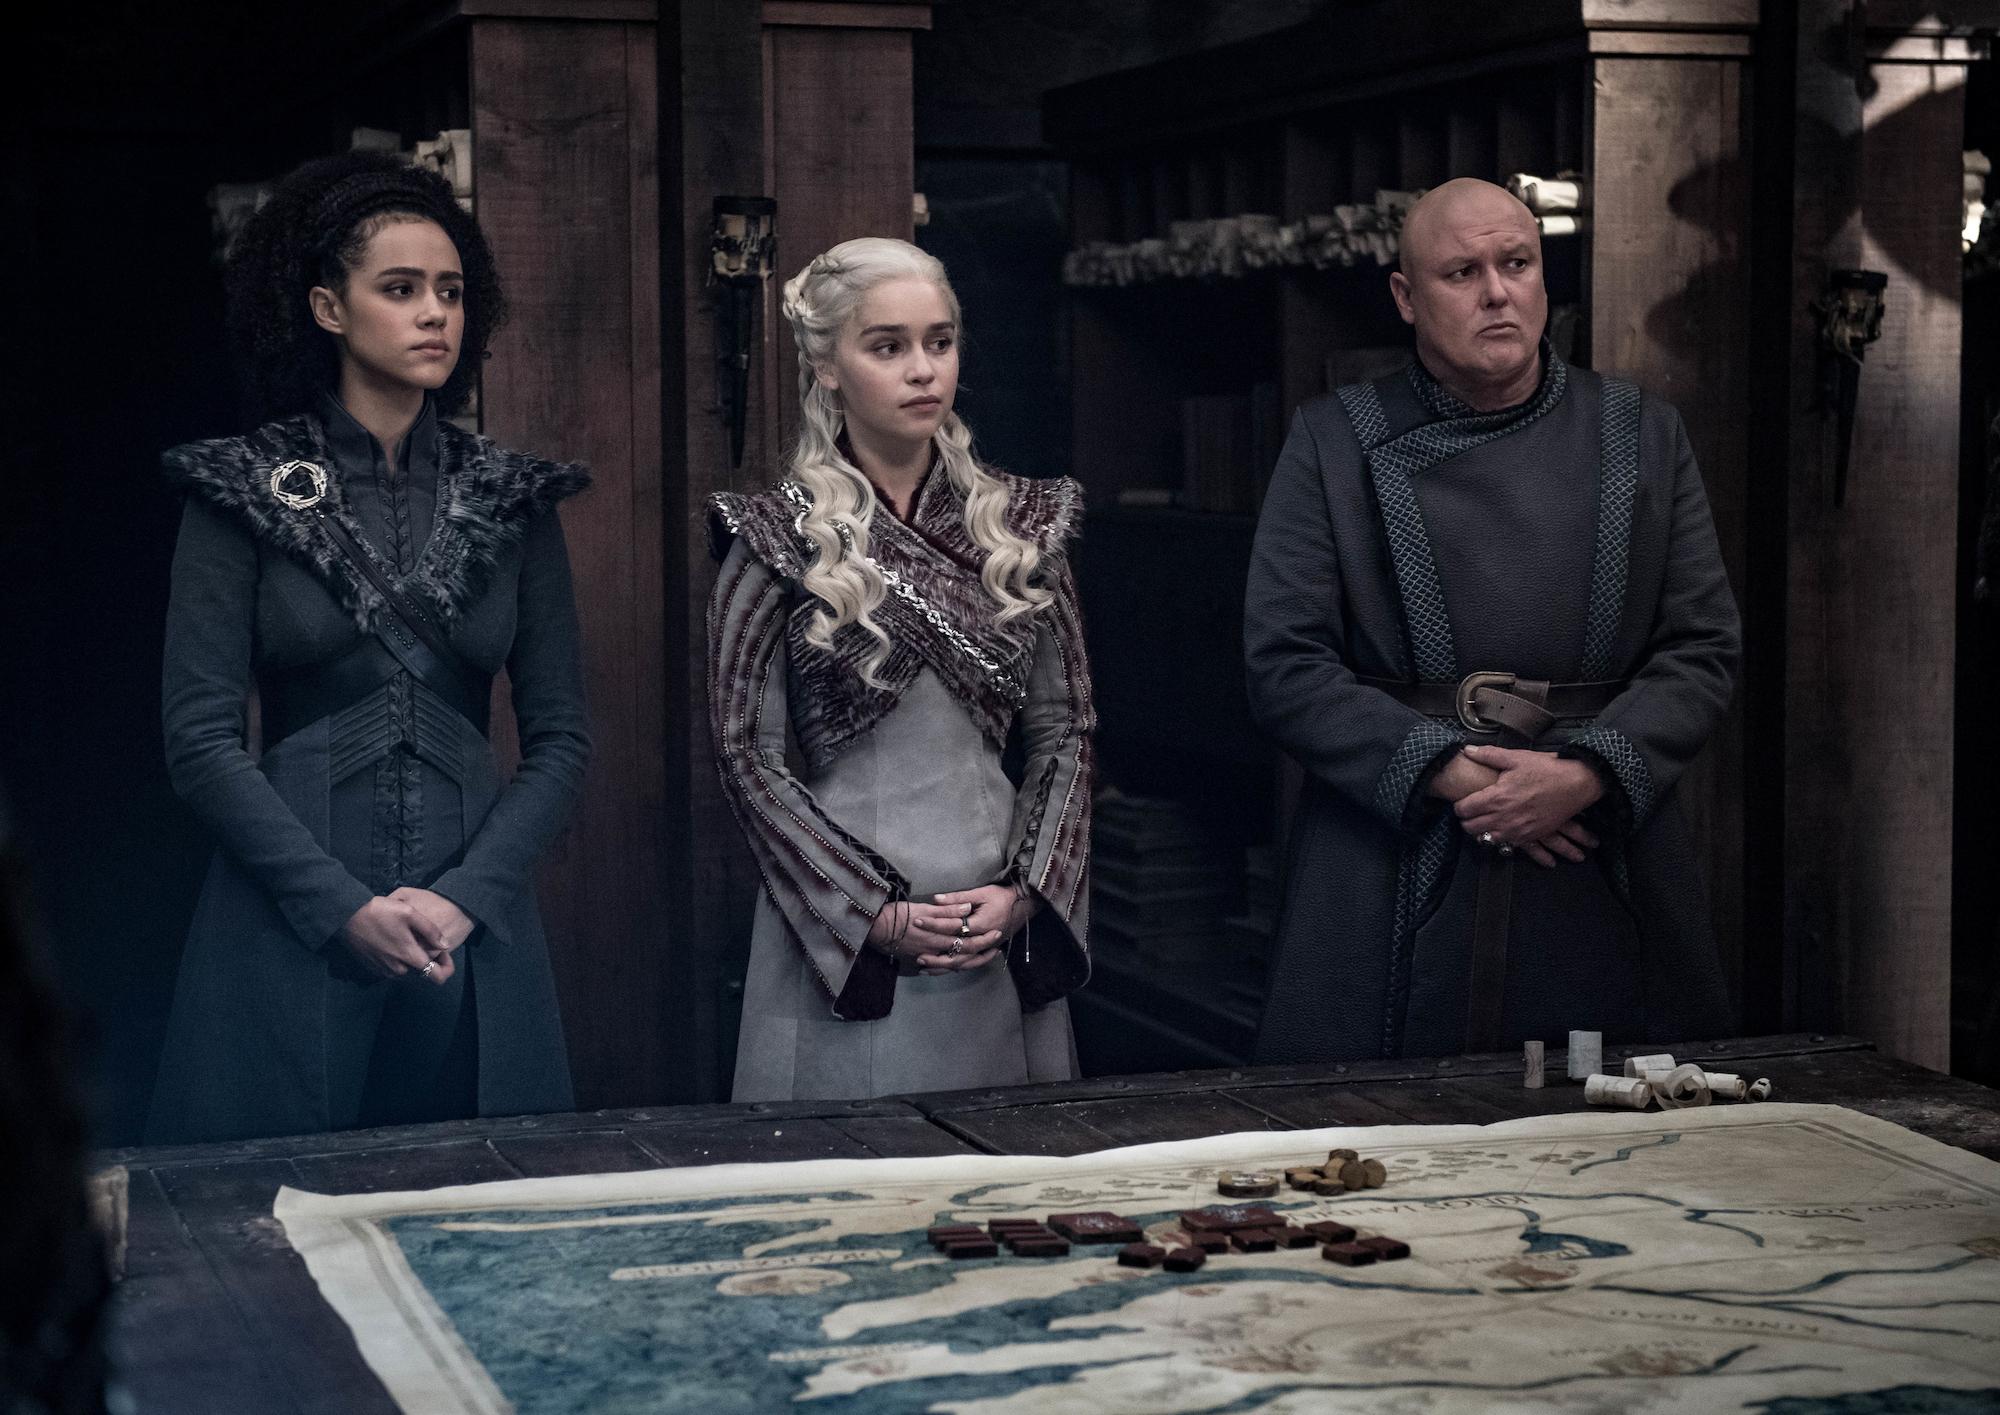 Missandei (Nathalie Emmanuel), Daenerys (Emilia Clarke), and Varys (Conleth Hill) in Season 8, Episode 4, 'Game of Thrones'